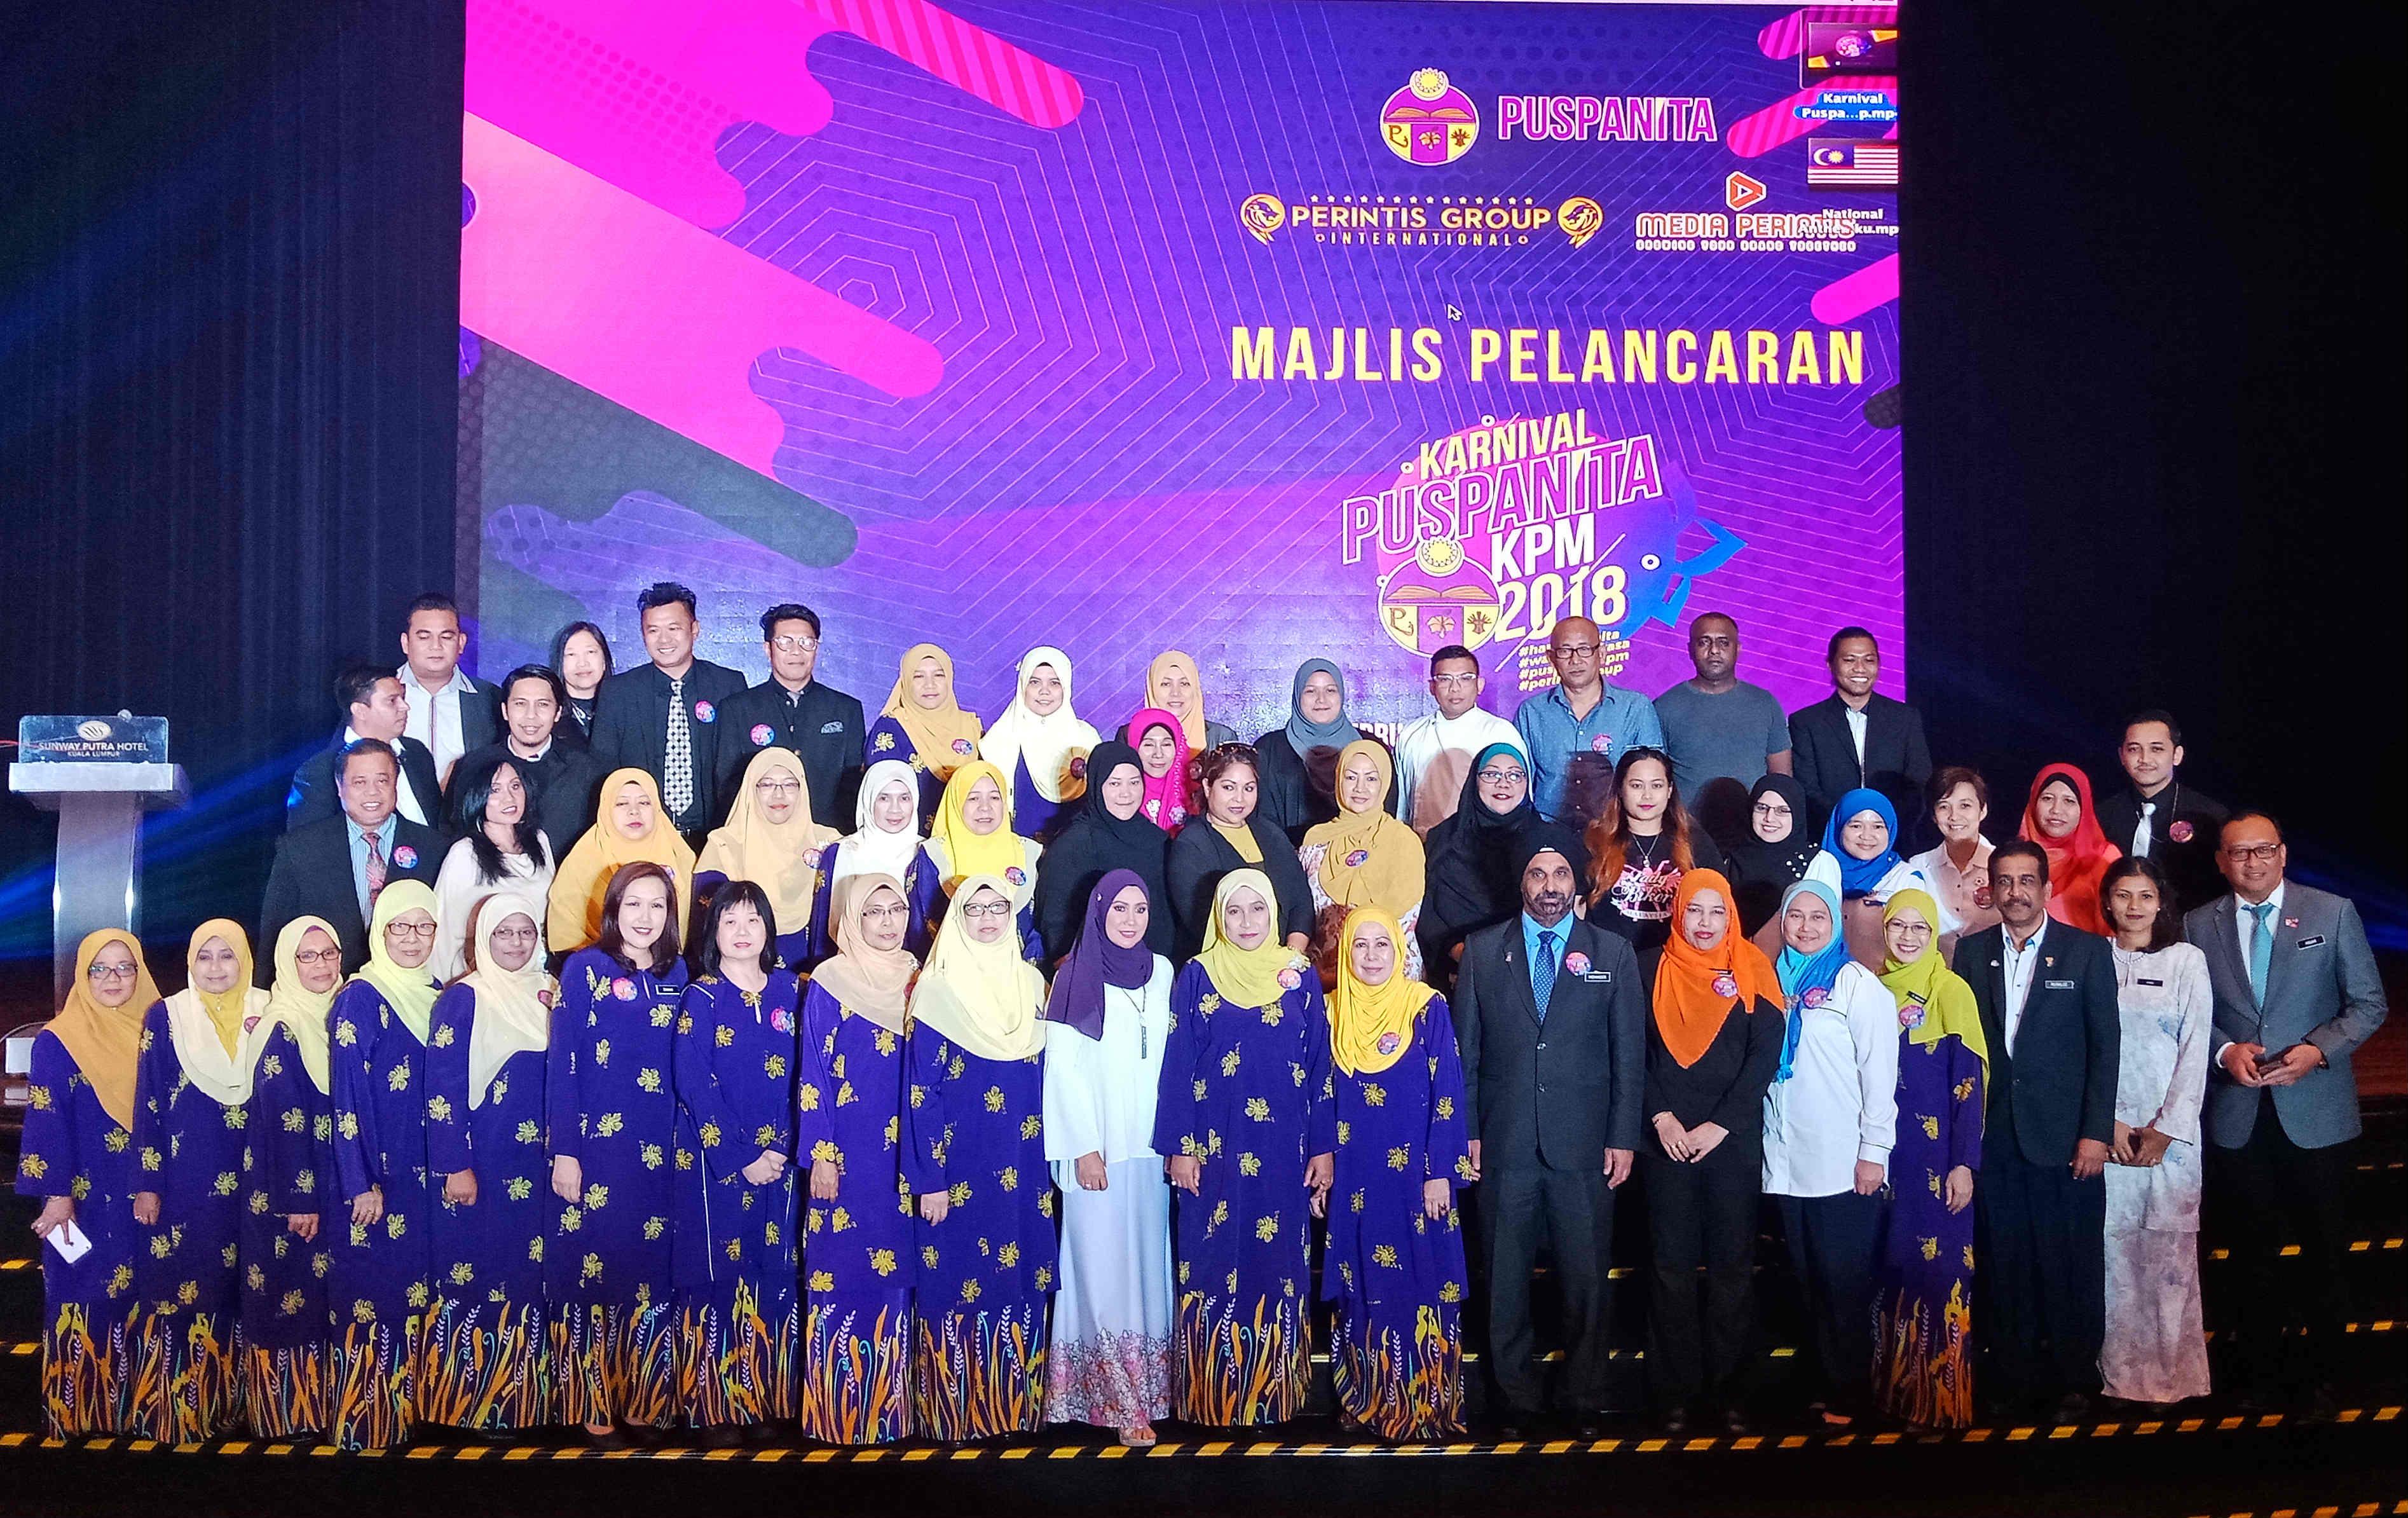 PUSPANITA Kementerian Pendidikan Malaysia